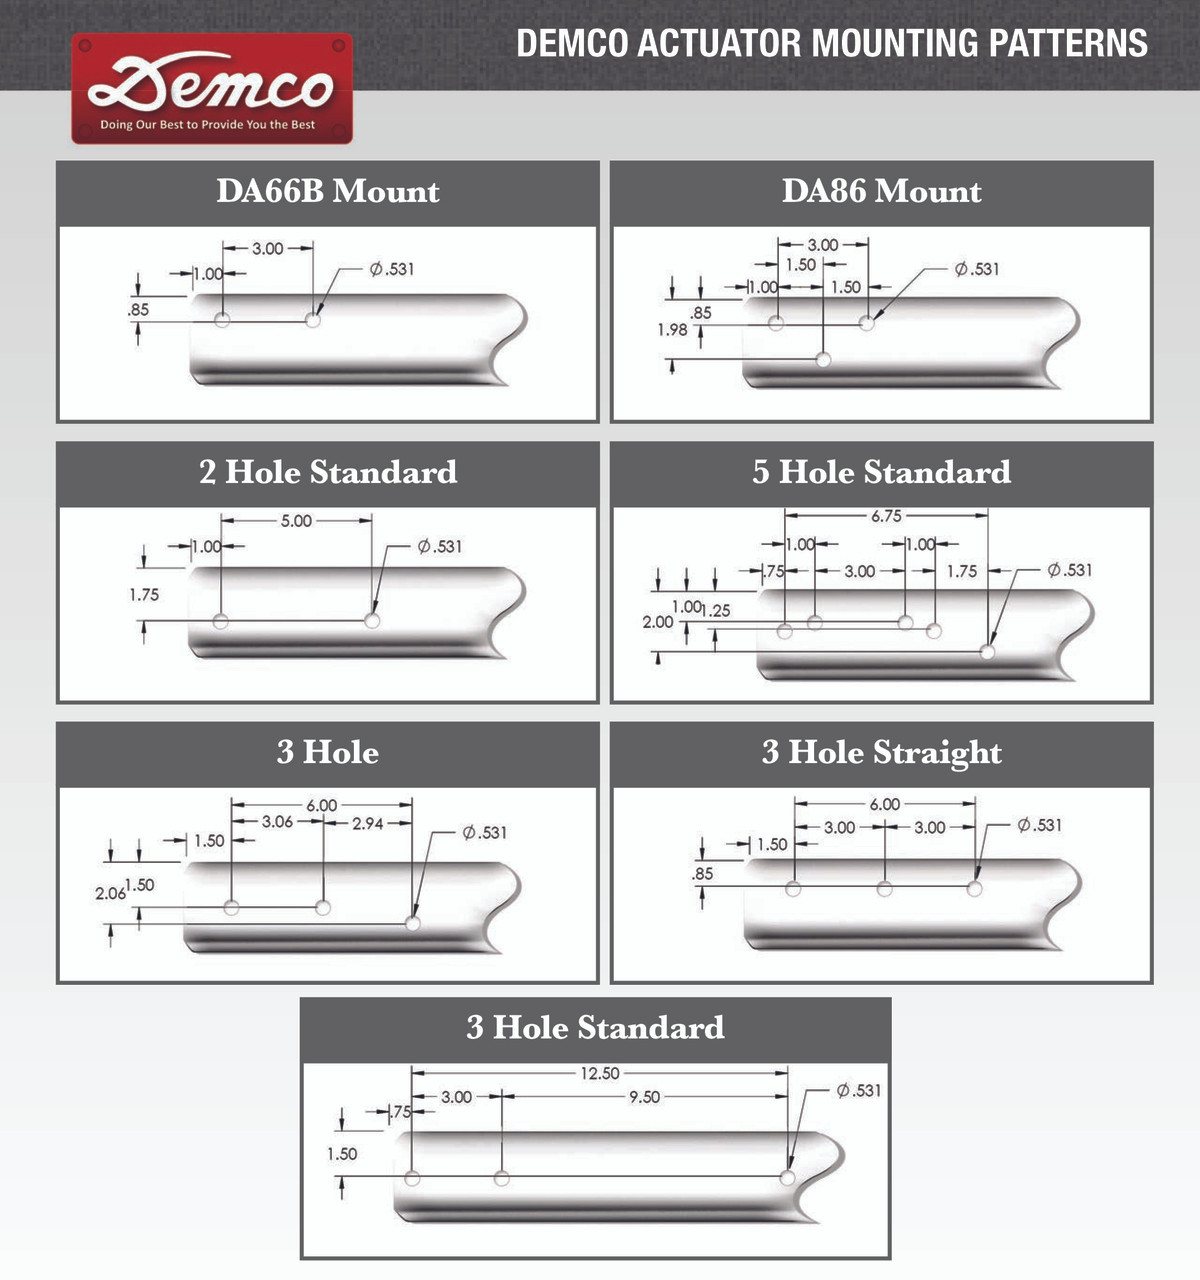 8758521 --- Demco Hydraulic Brake Actuator with Centered Channel - 8,000 lb Capacity - Model DA91